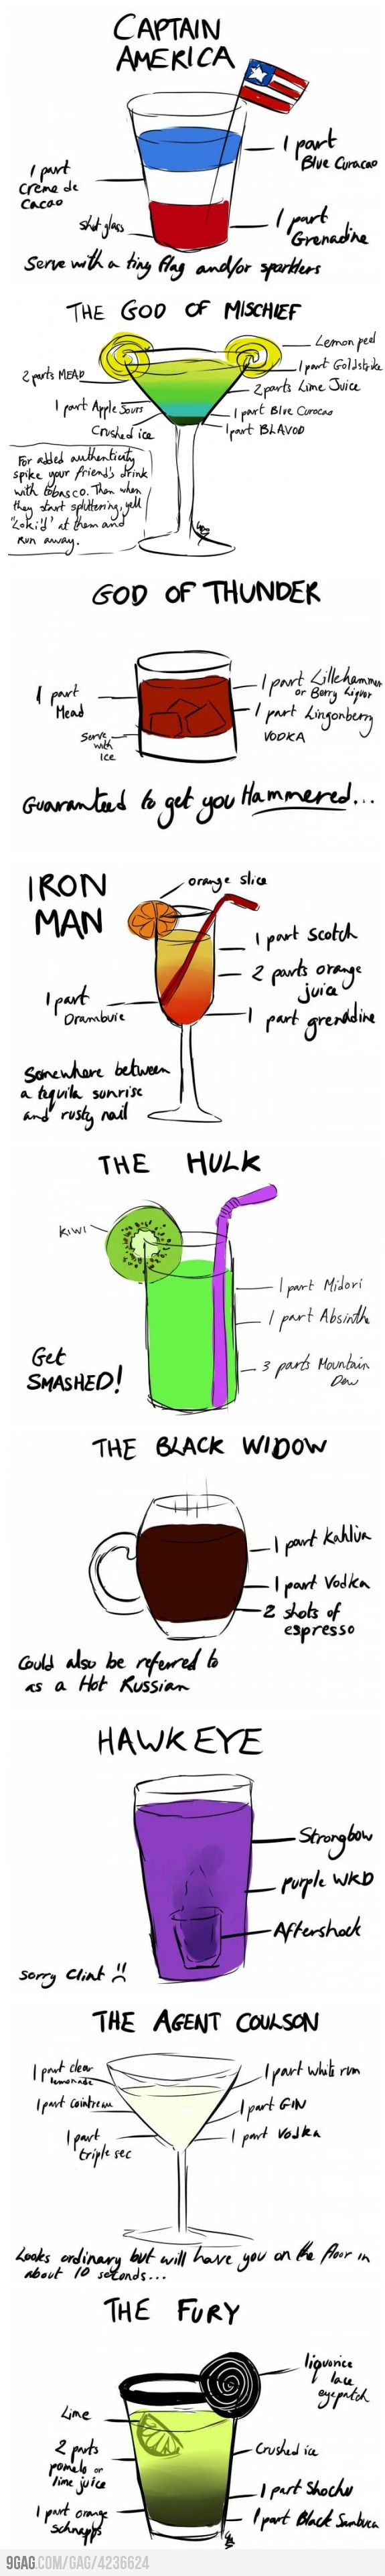 Avengers Cocktails... YESSSSSS!!!! i love it, god of thunder will get you hammered ;)